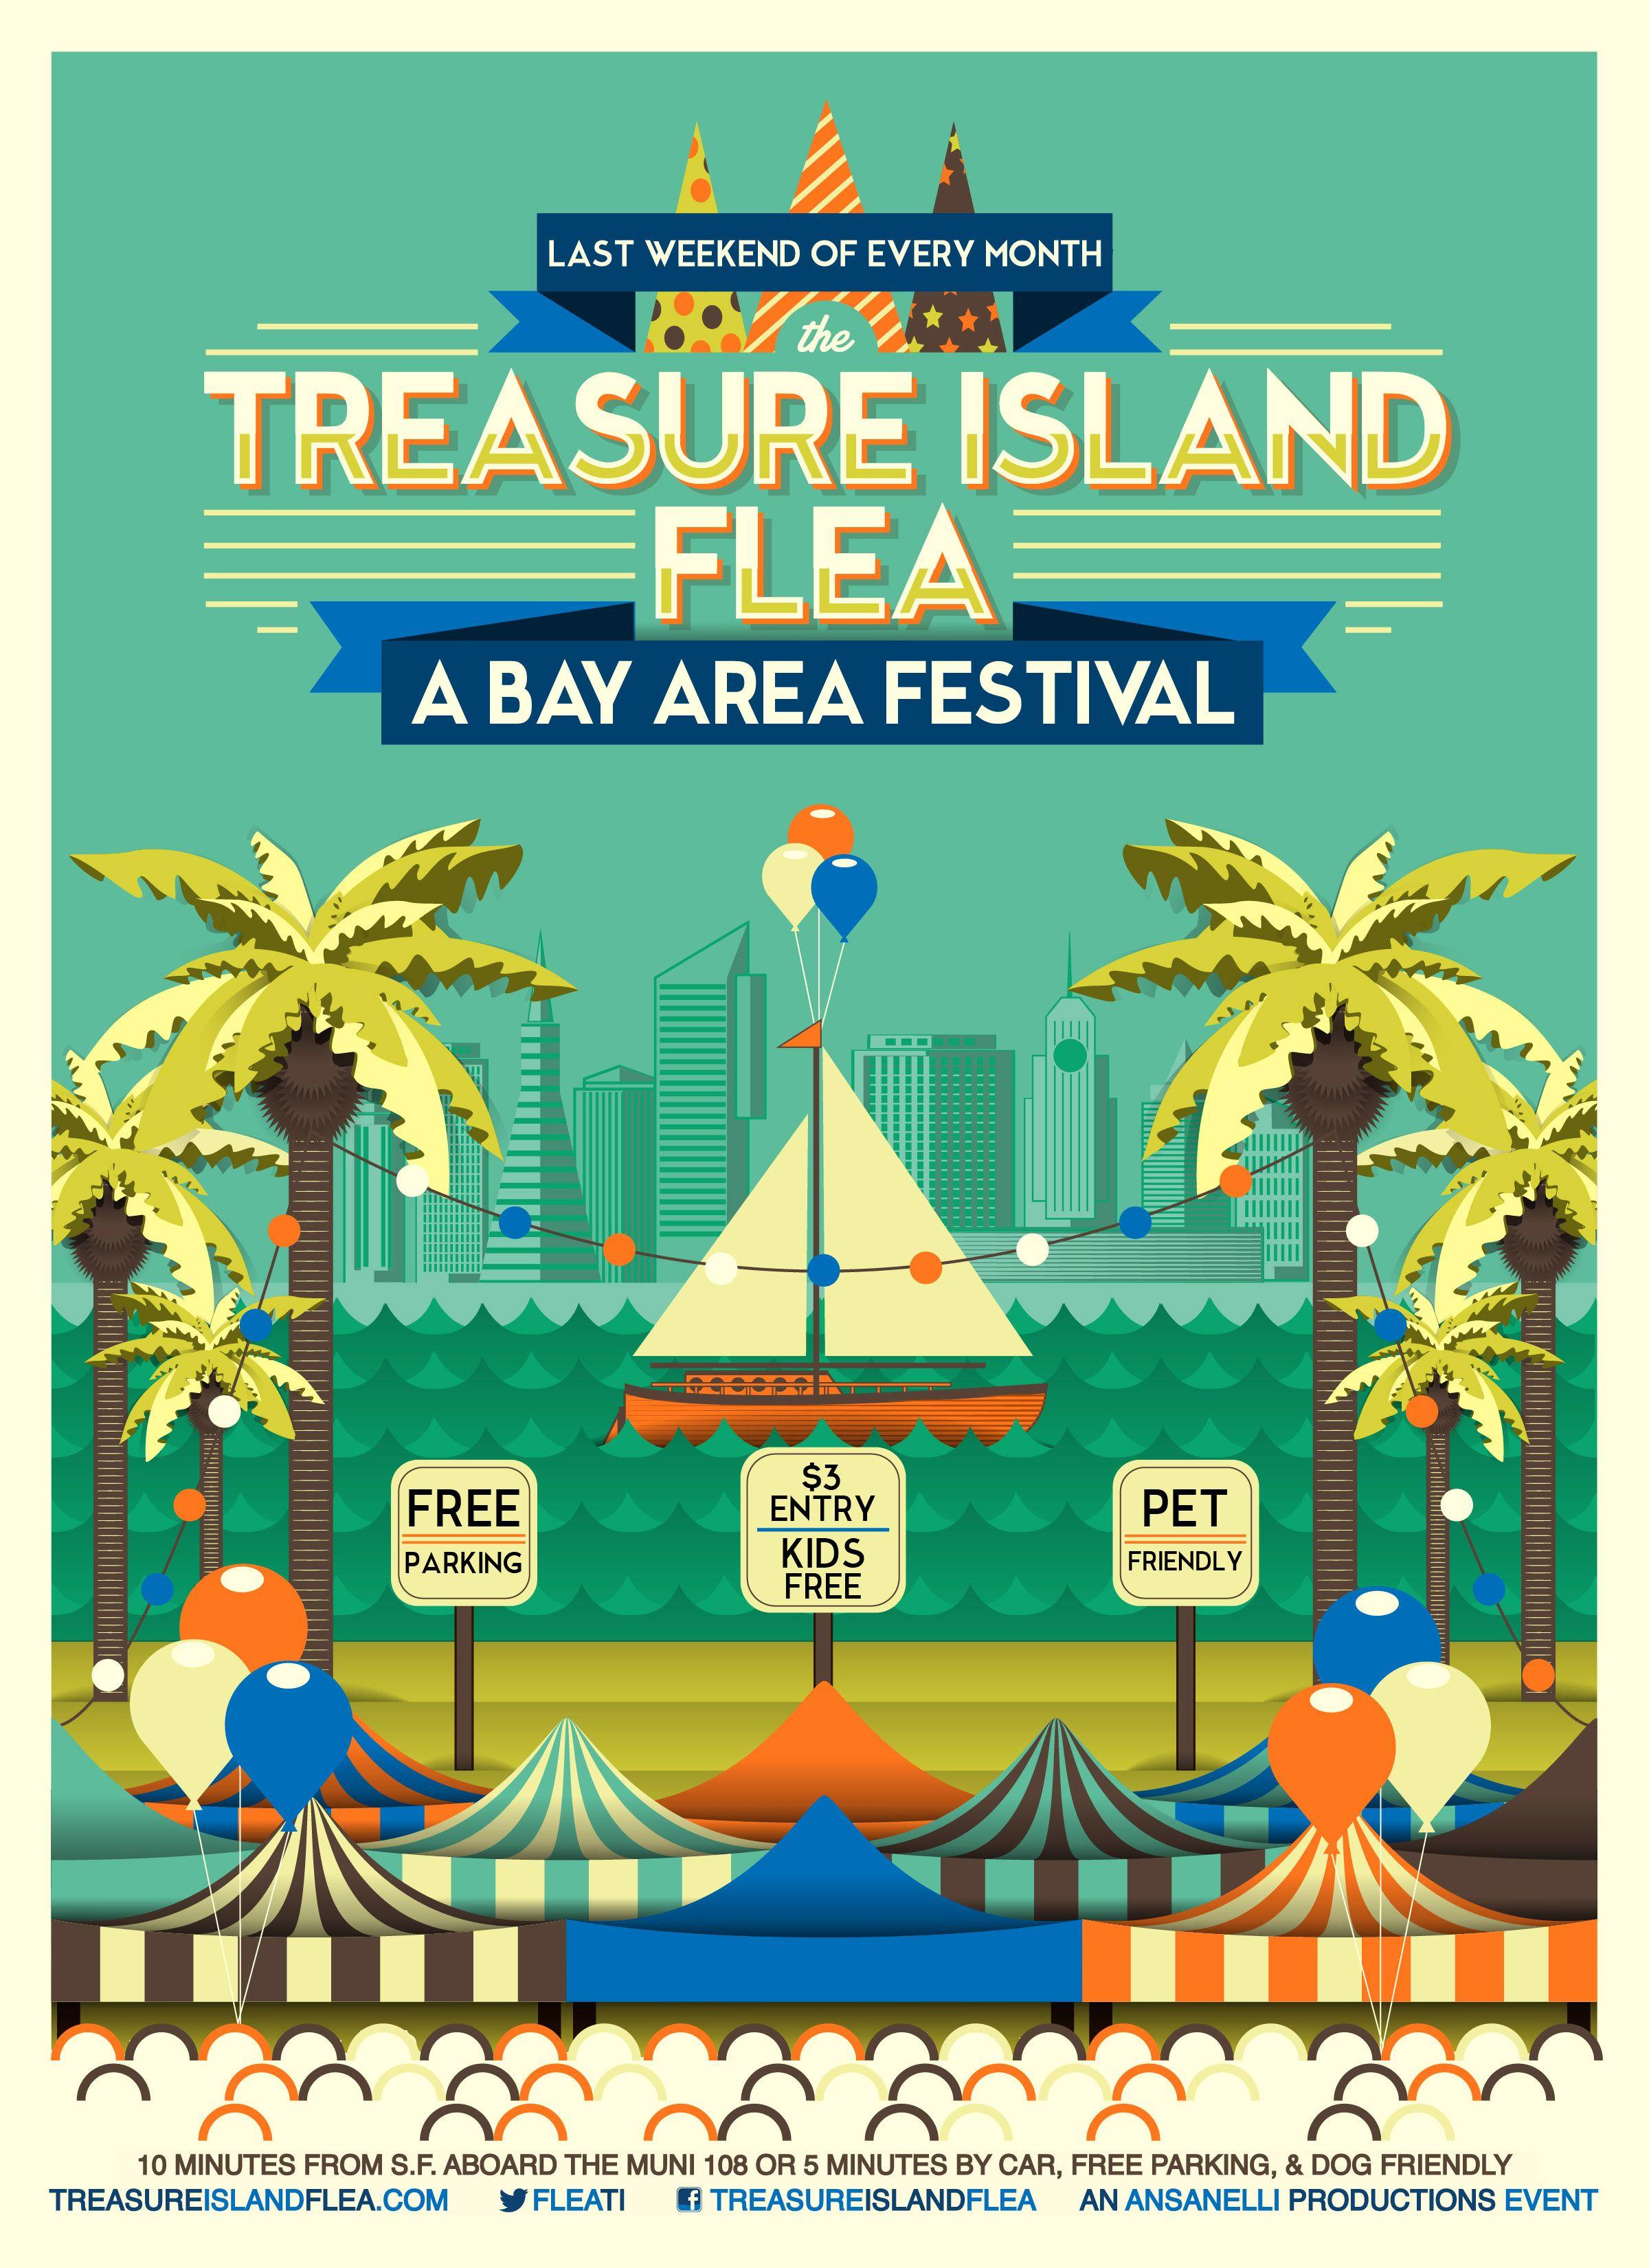 Treasure Island Flea San Francisco Flea Market Festival Food Truck Treasure Island City Guide San Francisco Fleas